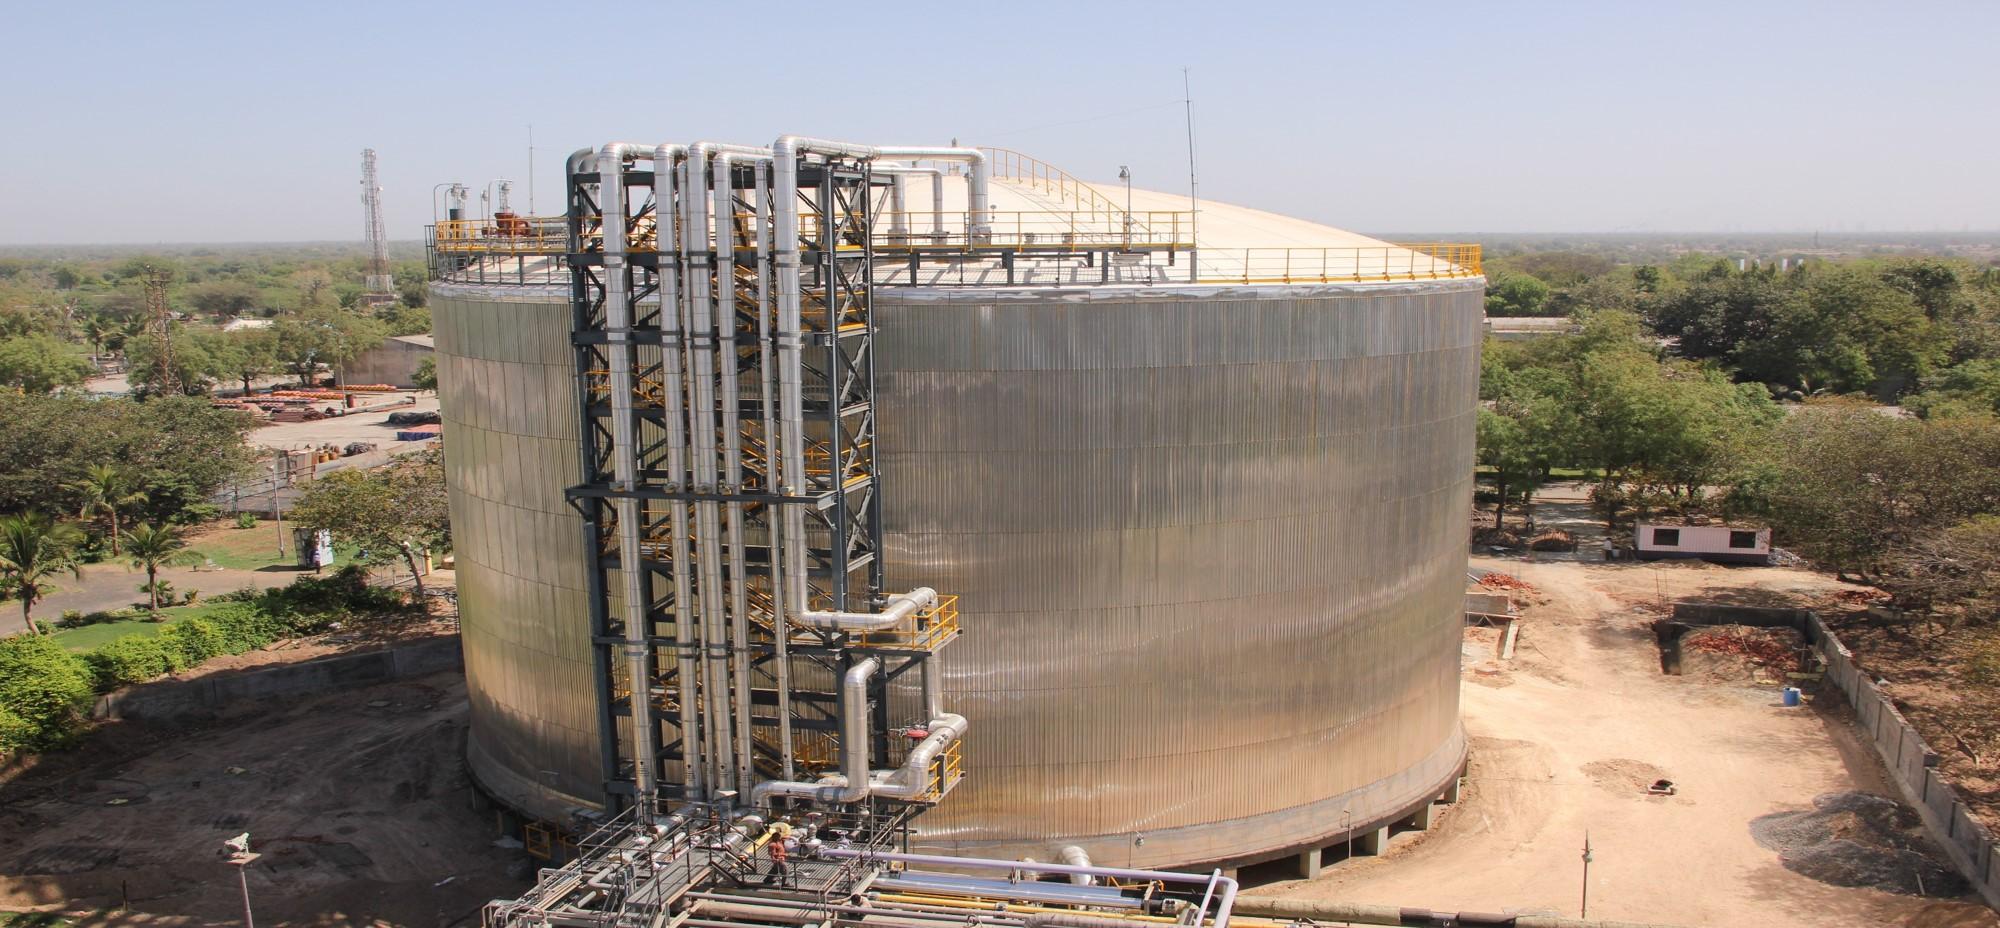 Cryogenic Storages July 2020